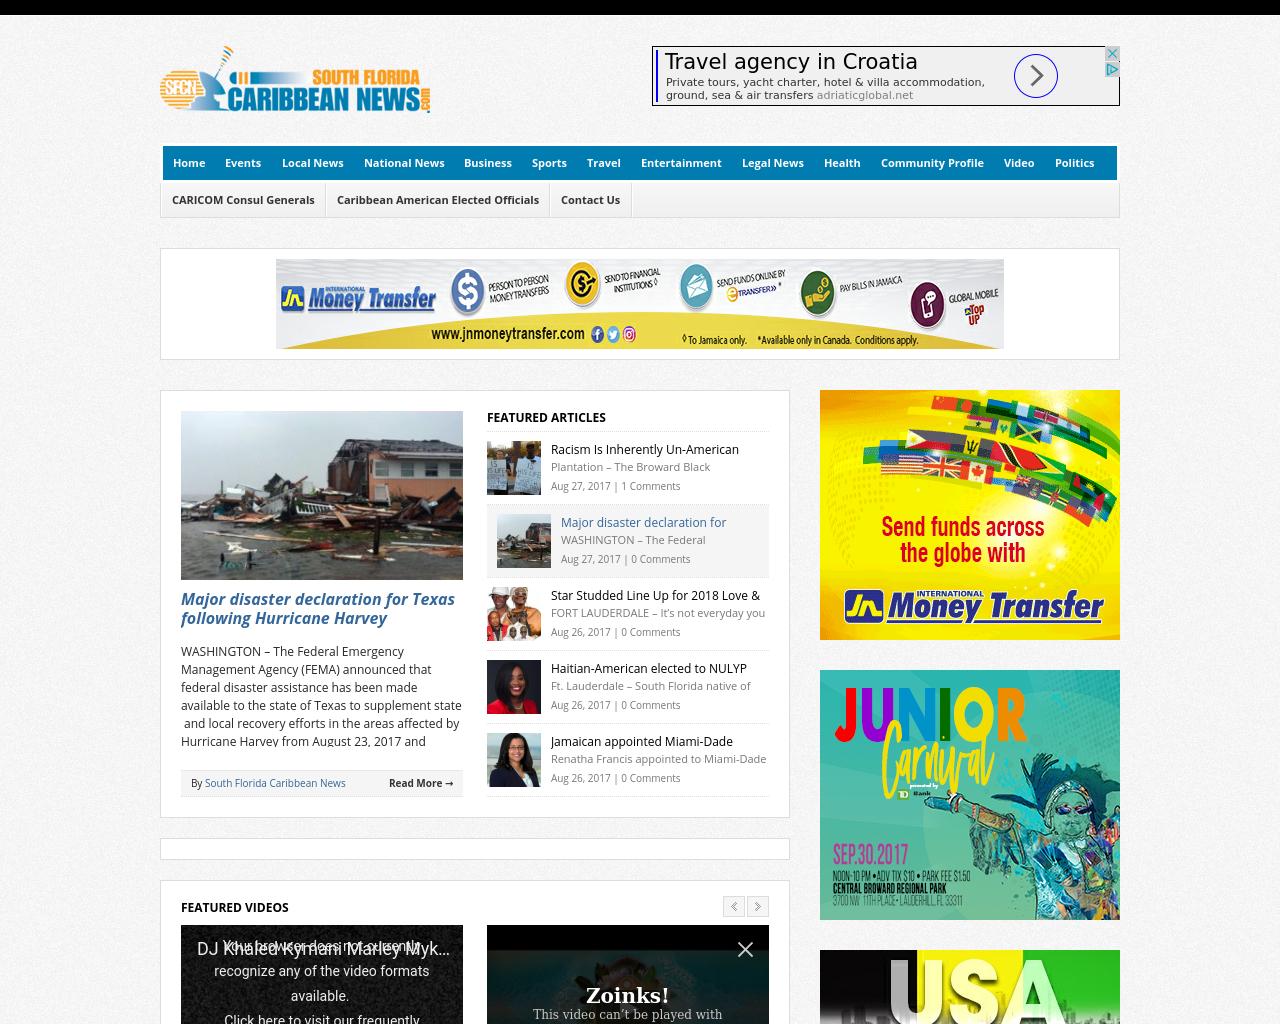 South-Florida-Caribbean-News-Advertising-Reviews-Pricing